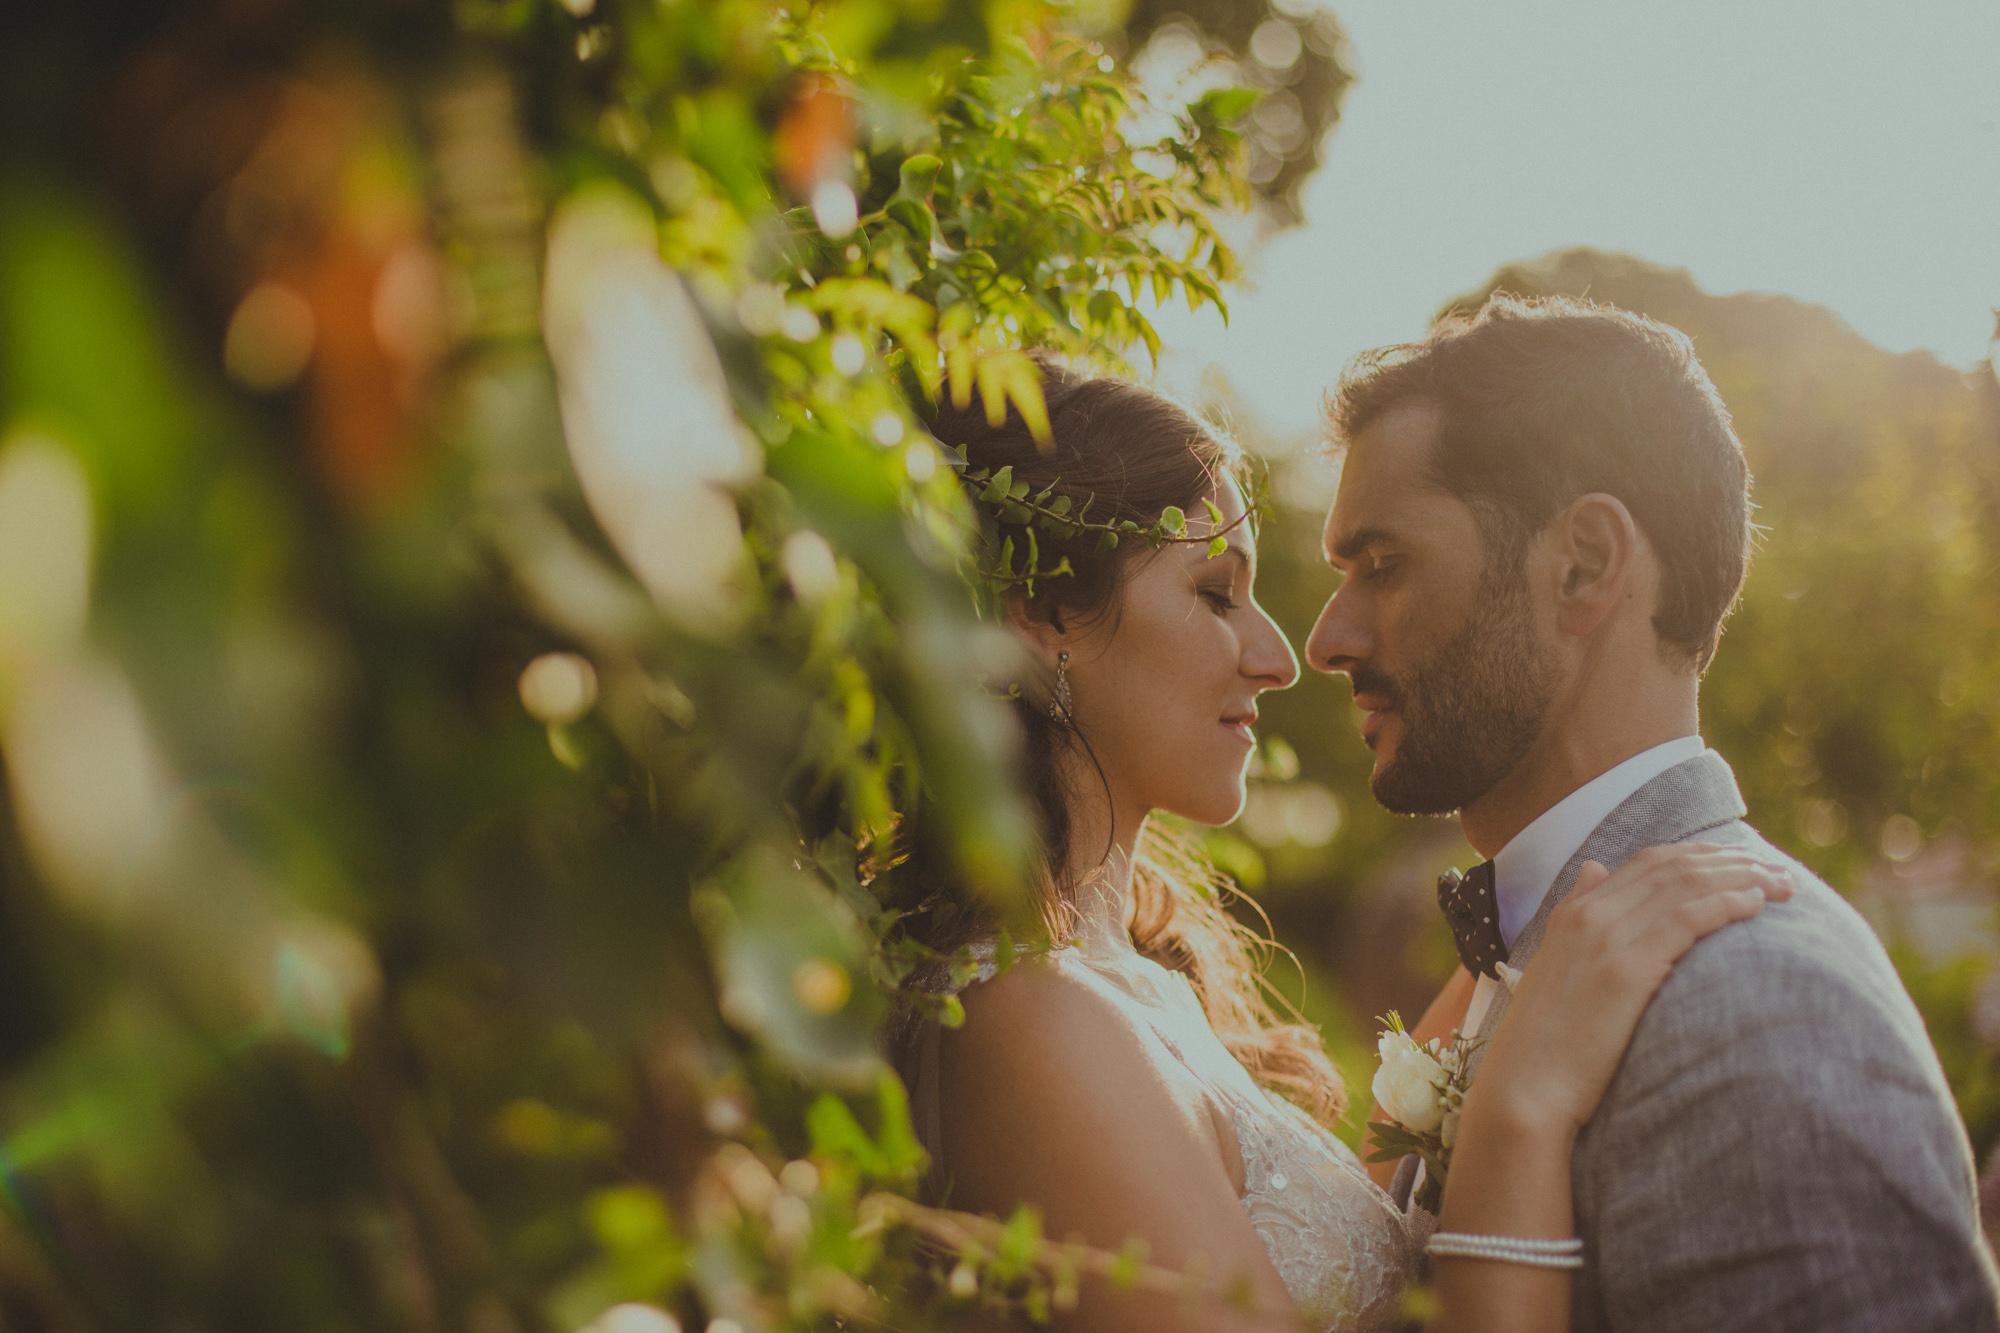 036-carina-e-samuel-wedding-casamento-quinta-dos-rouxinois-rustico-my-fancy-wedding-mafra-malveira-lisboa-sintra-cascais-filipe-santiago-fotografia-fotografo-lifestyle-destination-portugal